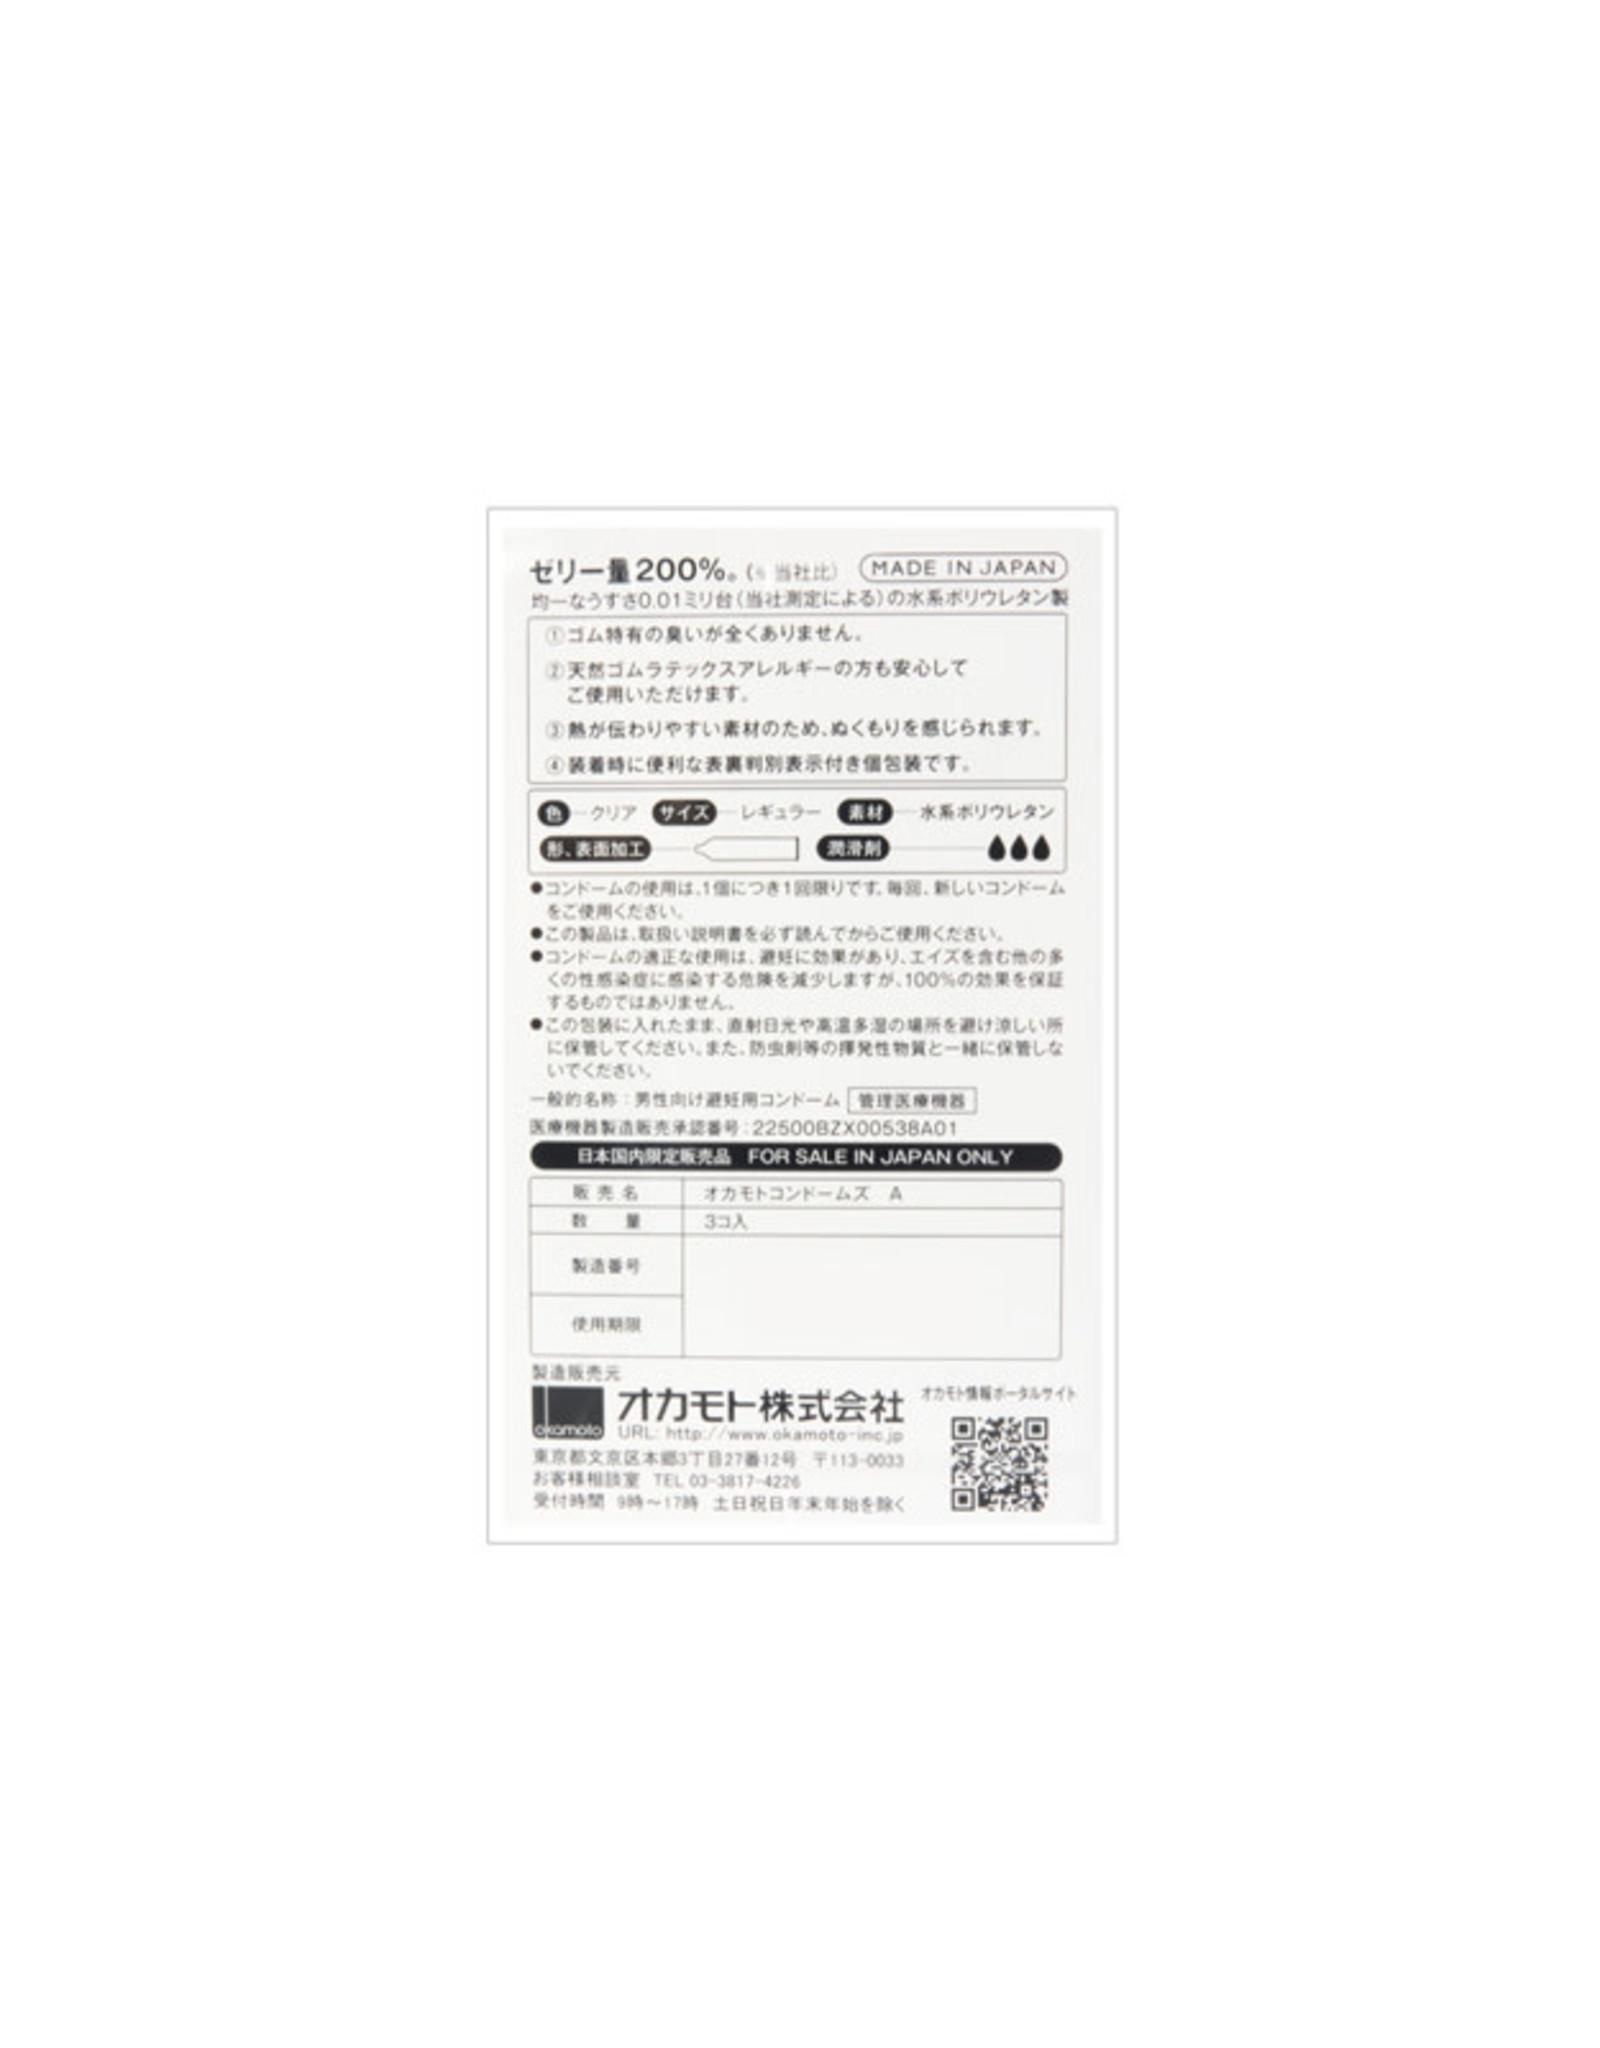 Okamoto Okamoto 0.01 Extra lubricated Condom Regular size 3pcs